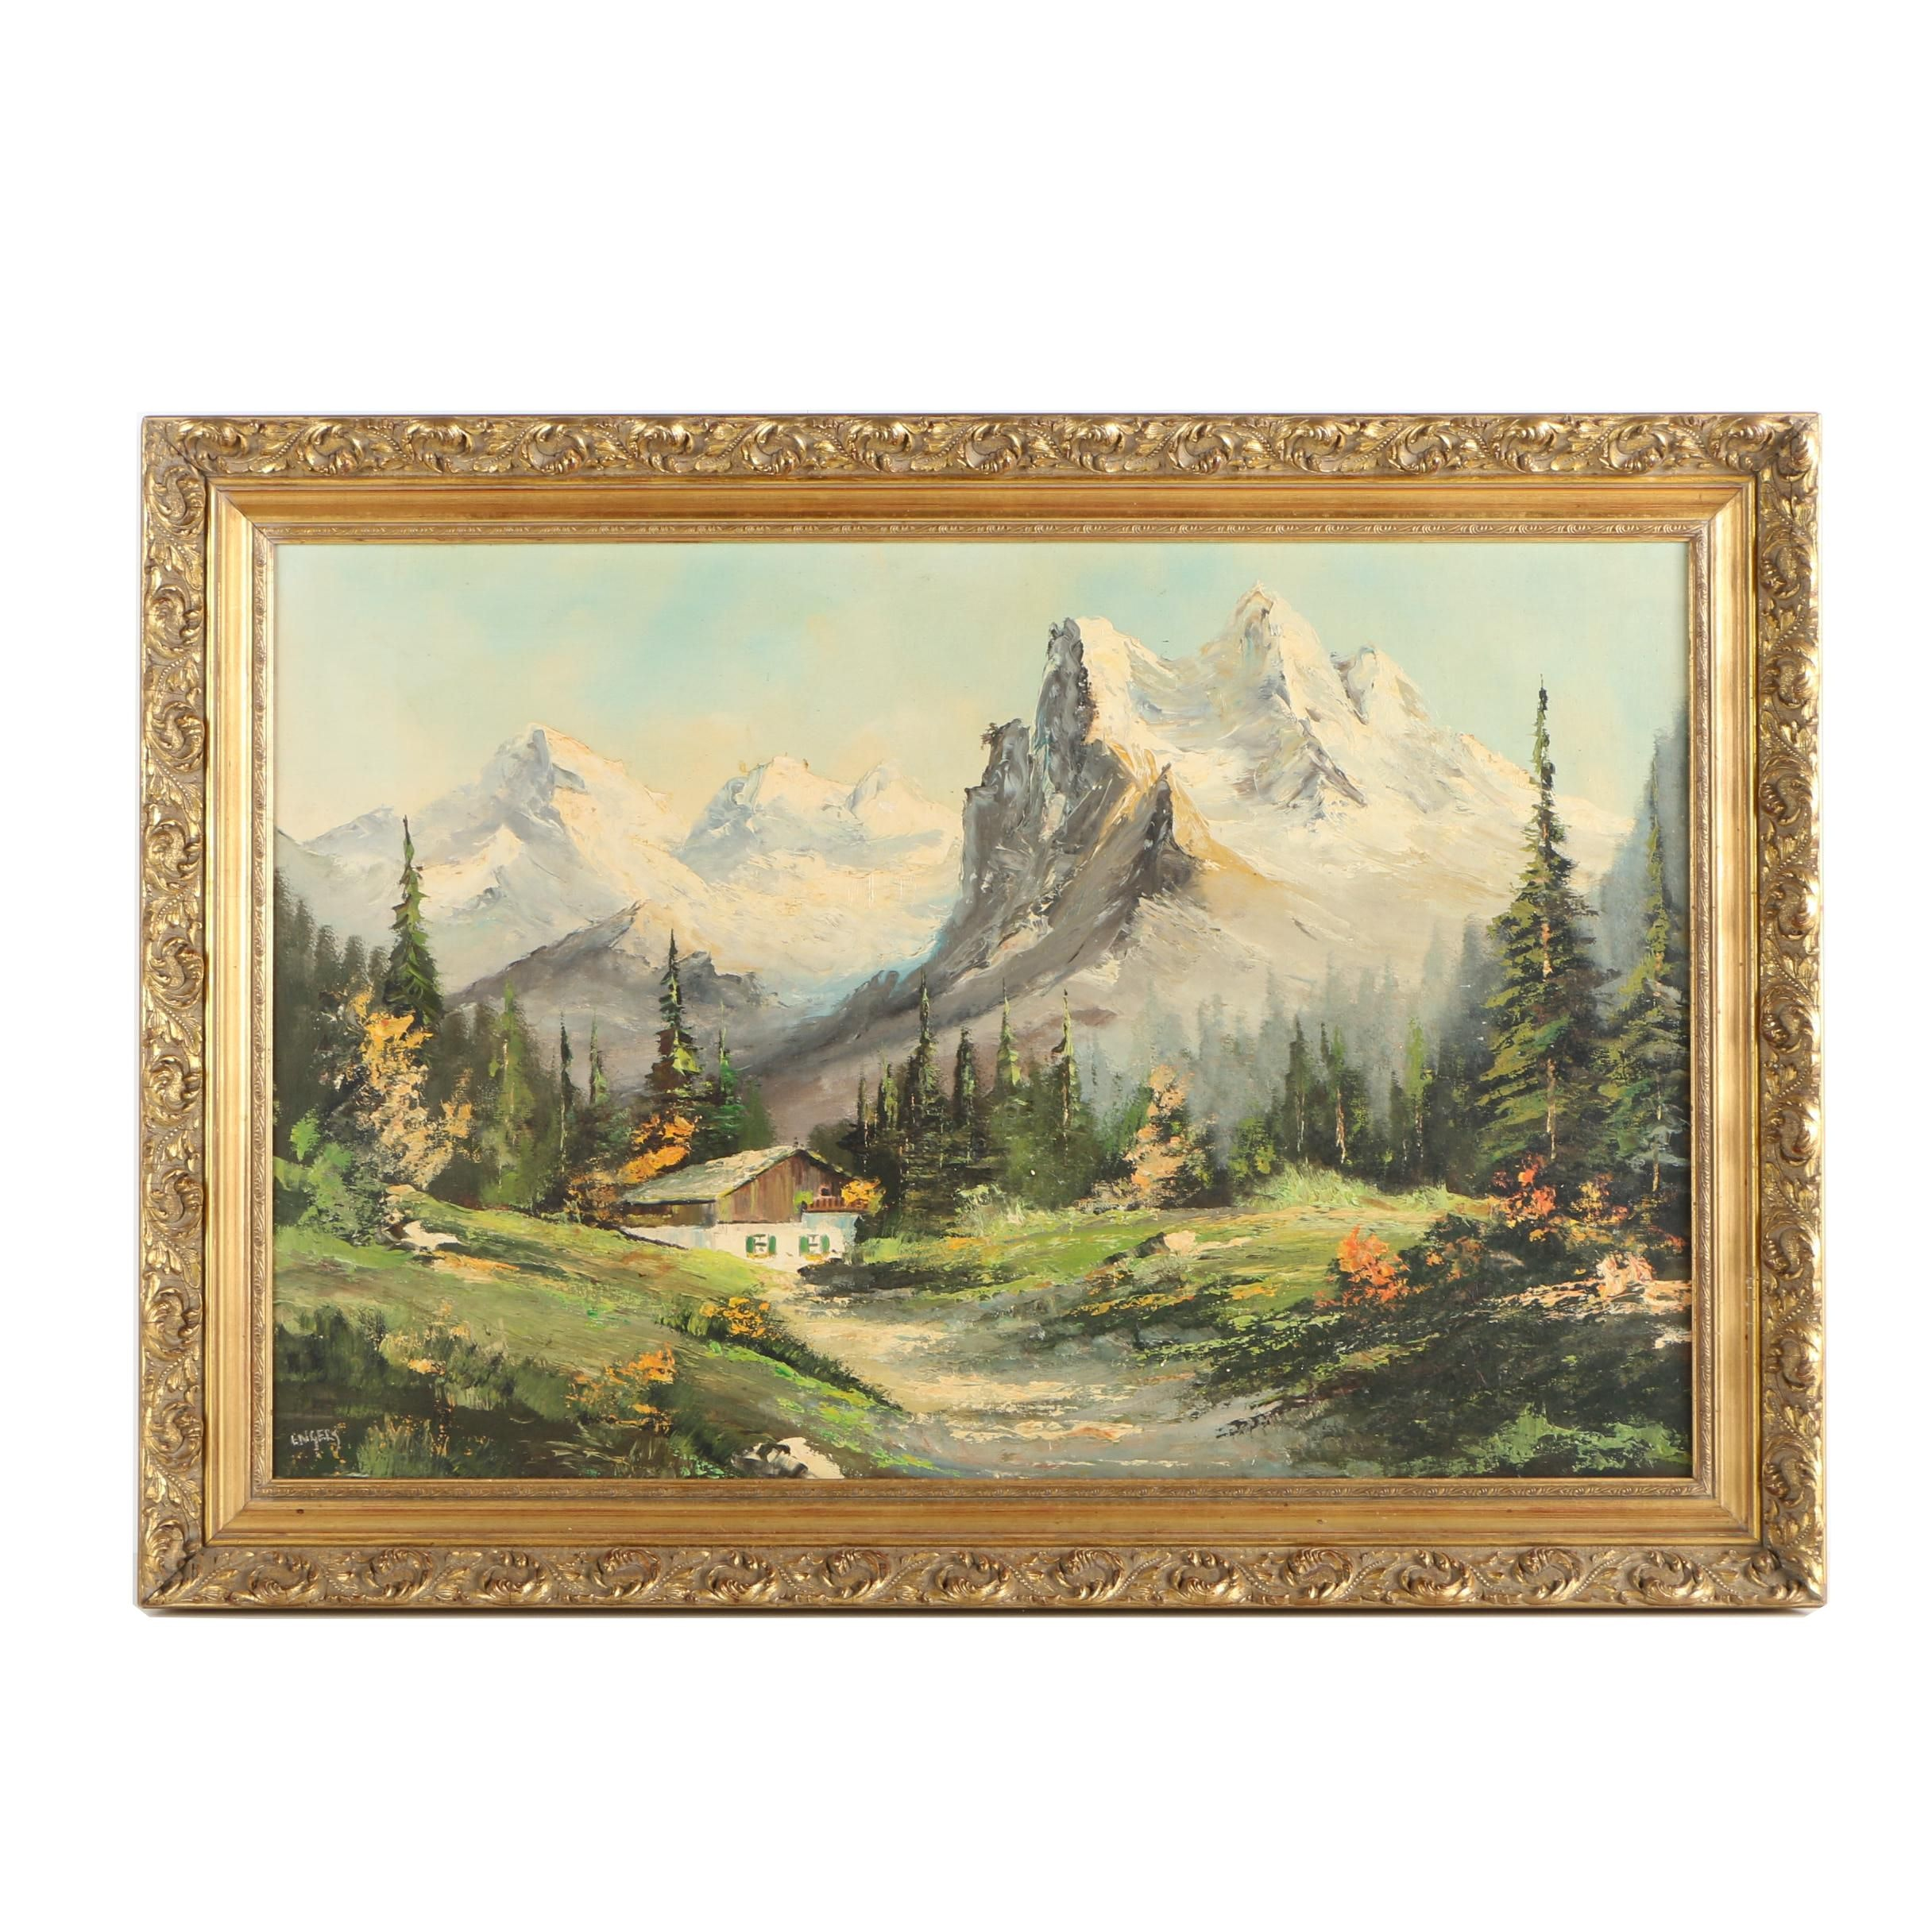 Engels Oil Painting of Landscape